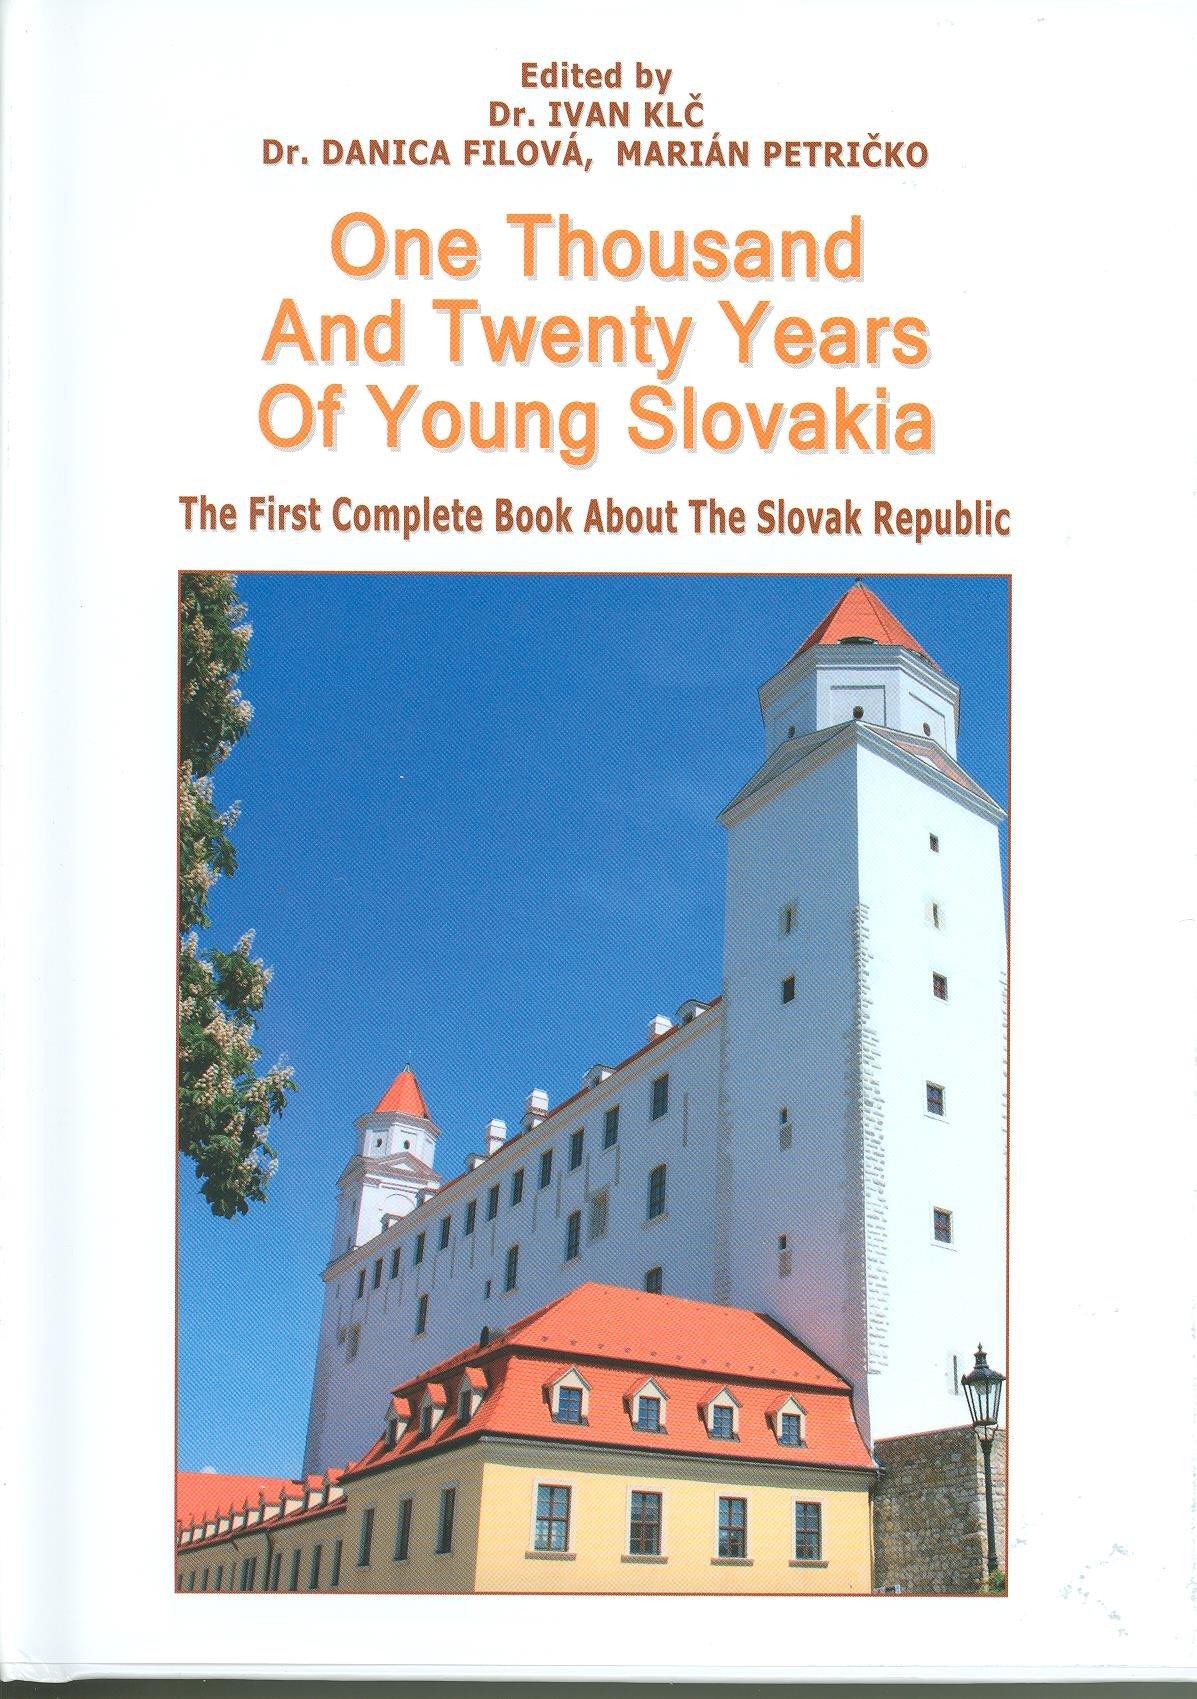 One Thousand And Twenty Years Of Young Slovakia pdf